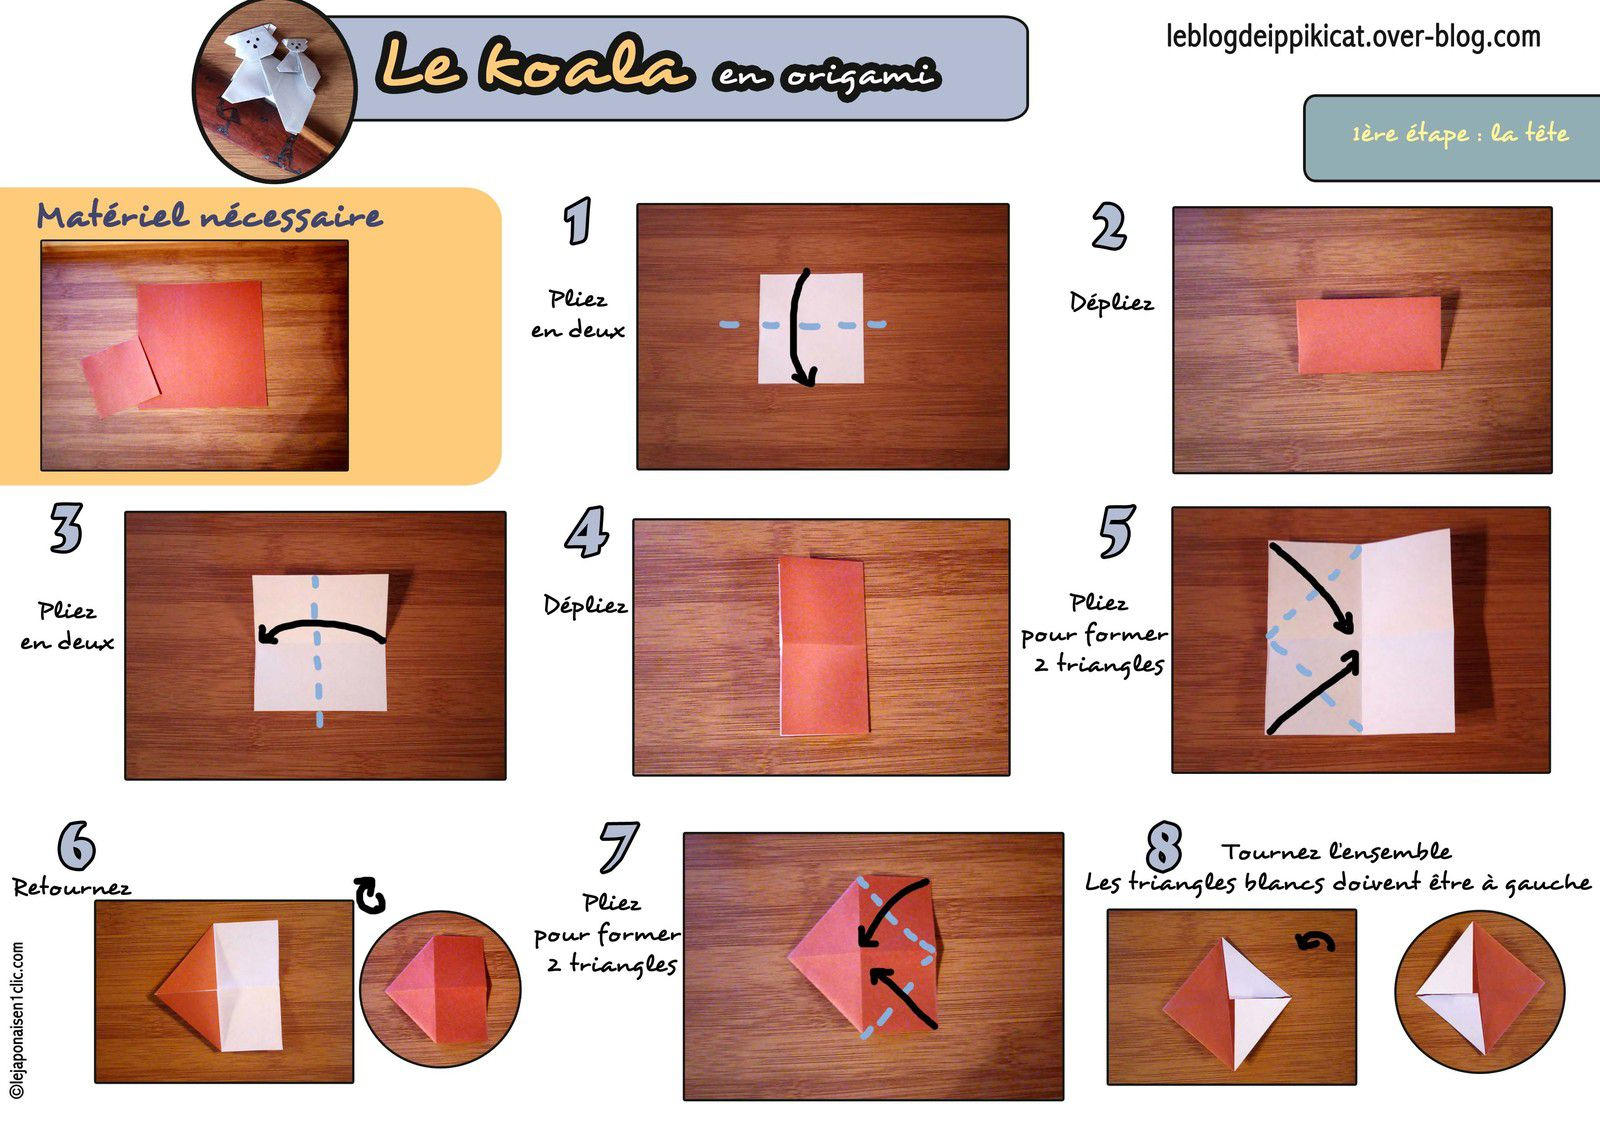 #koala #origami #blogdeippikicat #lejaponaisen1clic